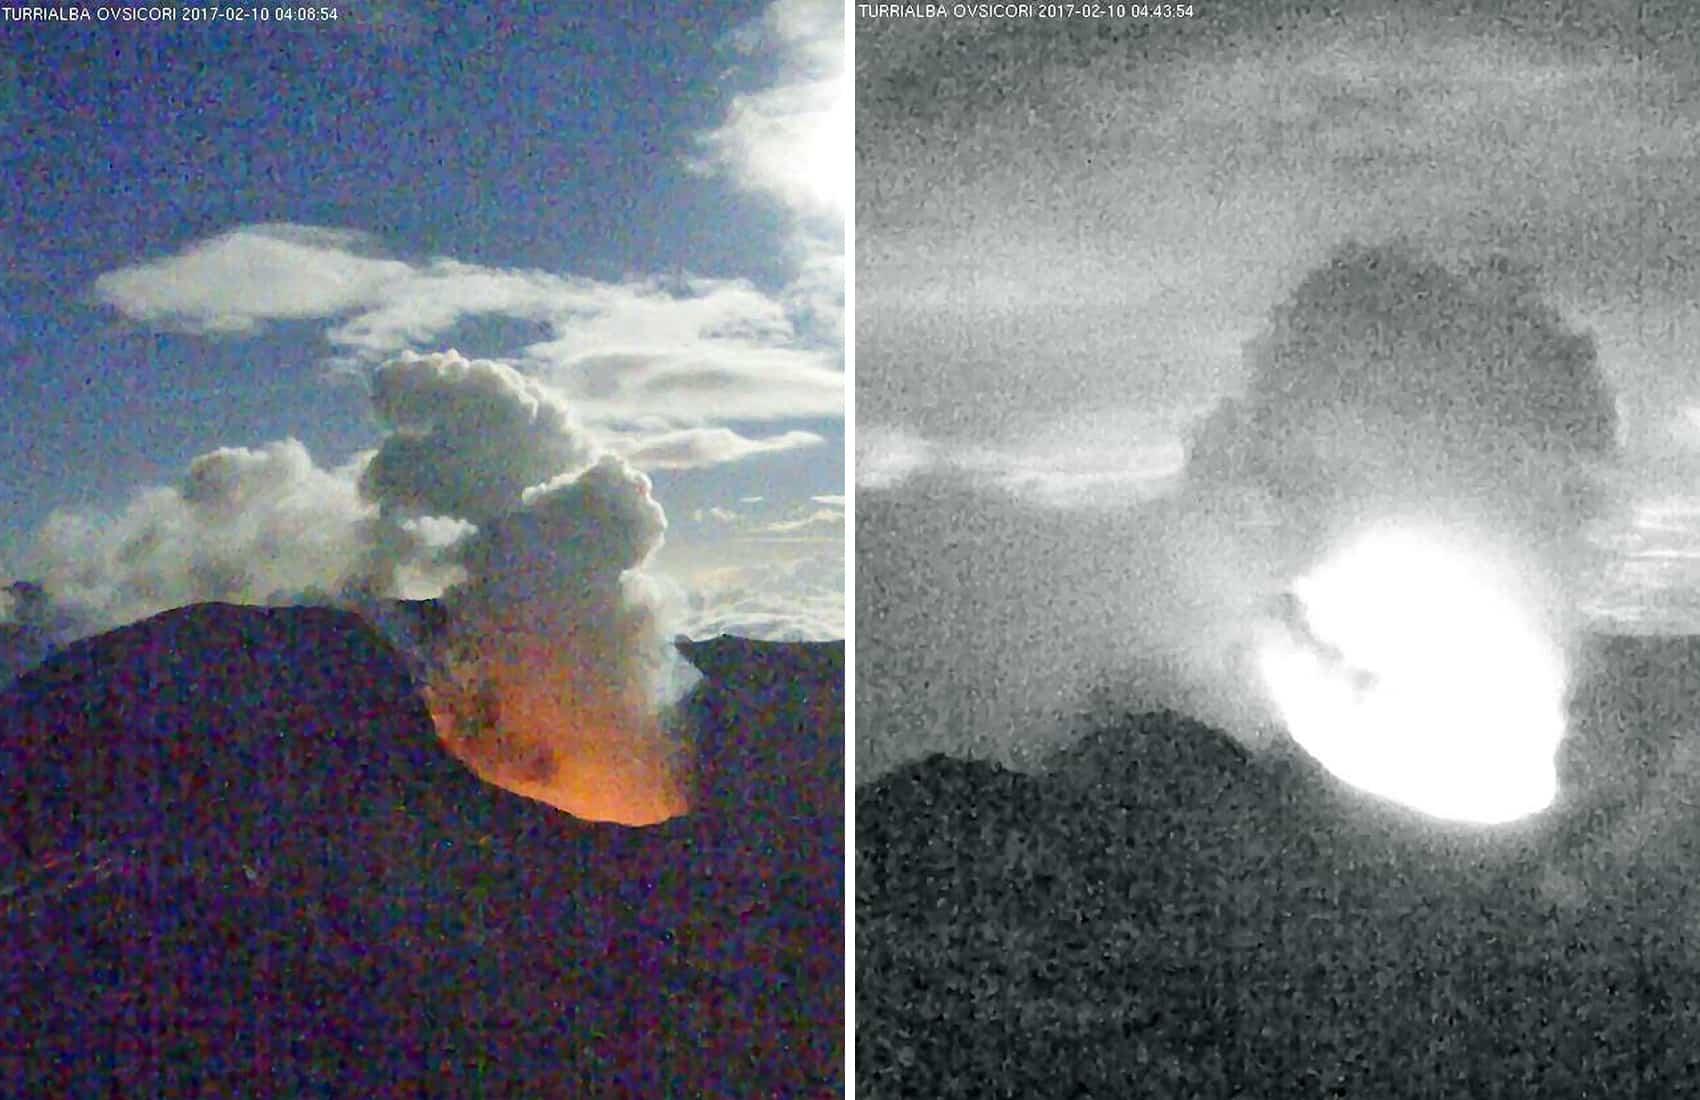 Incandescence (possible magma) at Turrialba Volcano. Feb. 10, 2017.